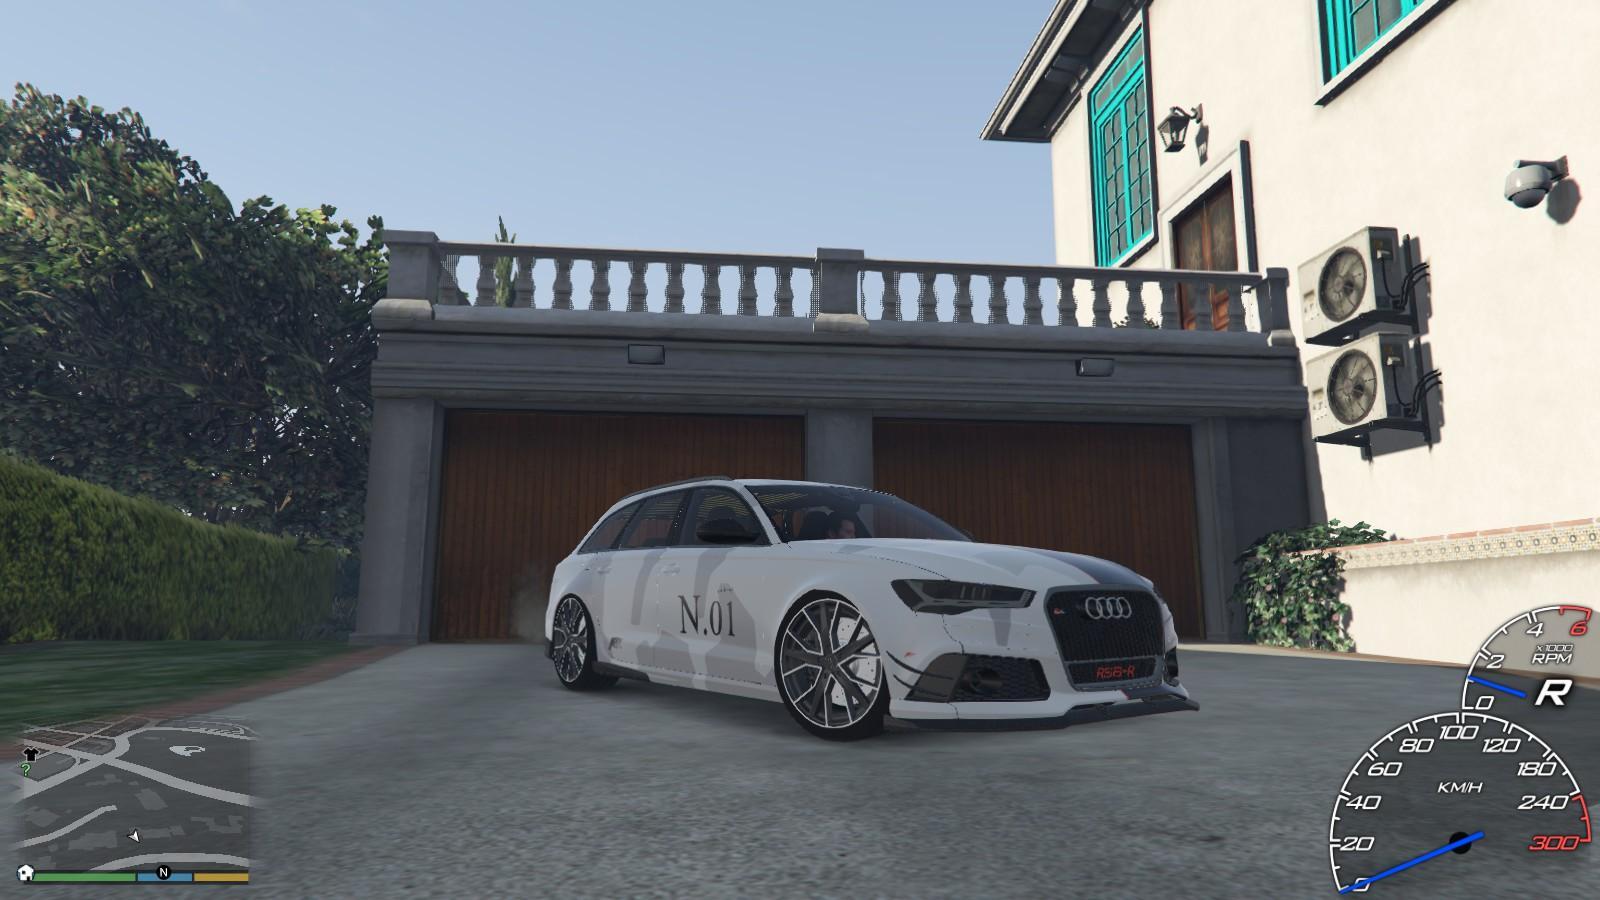 Jon Olsson S No 1 I Audi Rs6 Avant Abt Livery Gta5 Mods Com